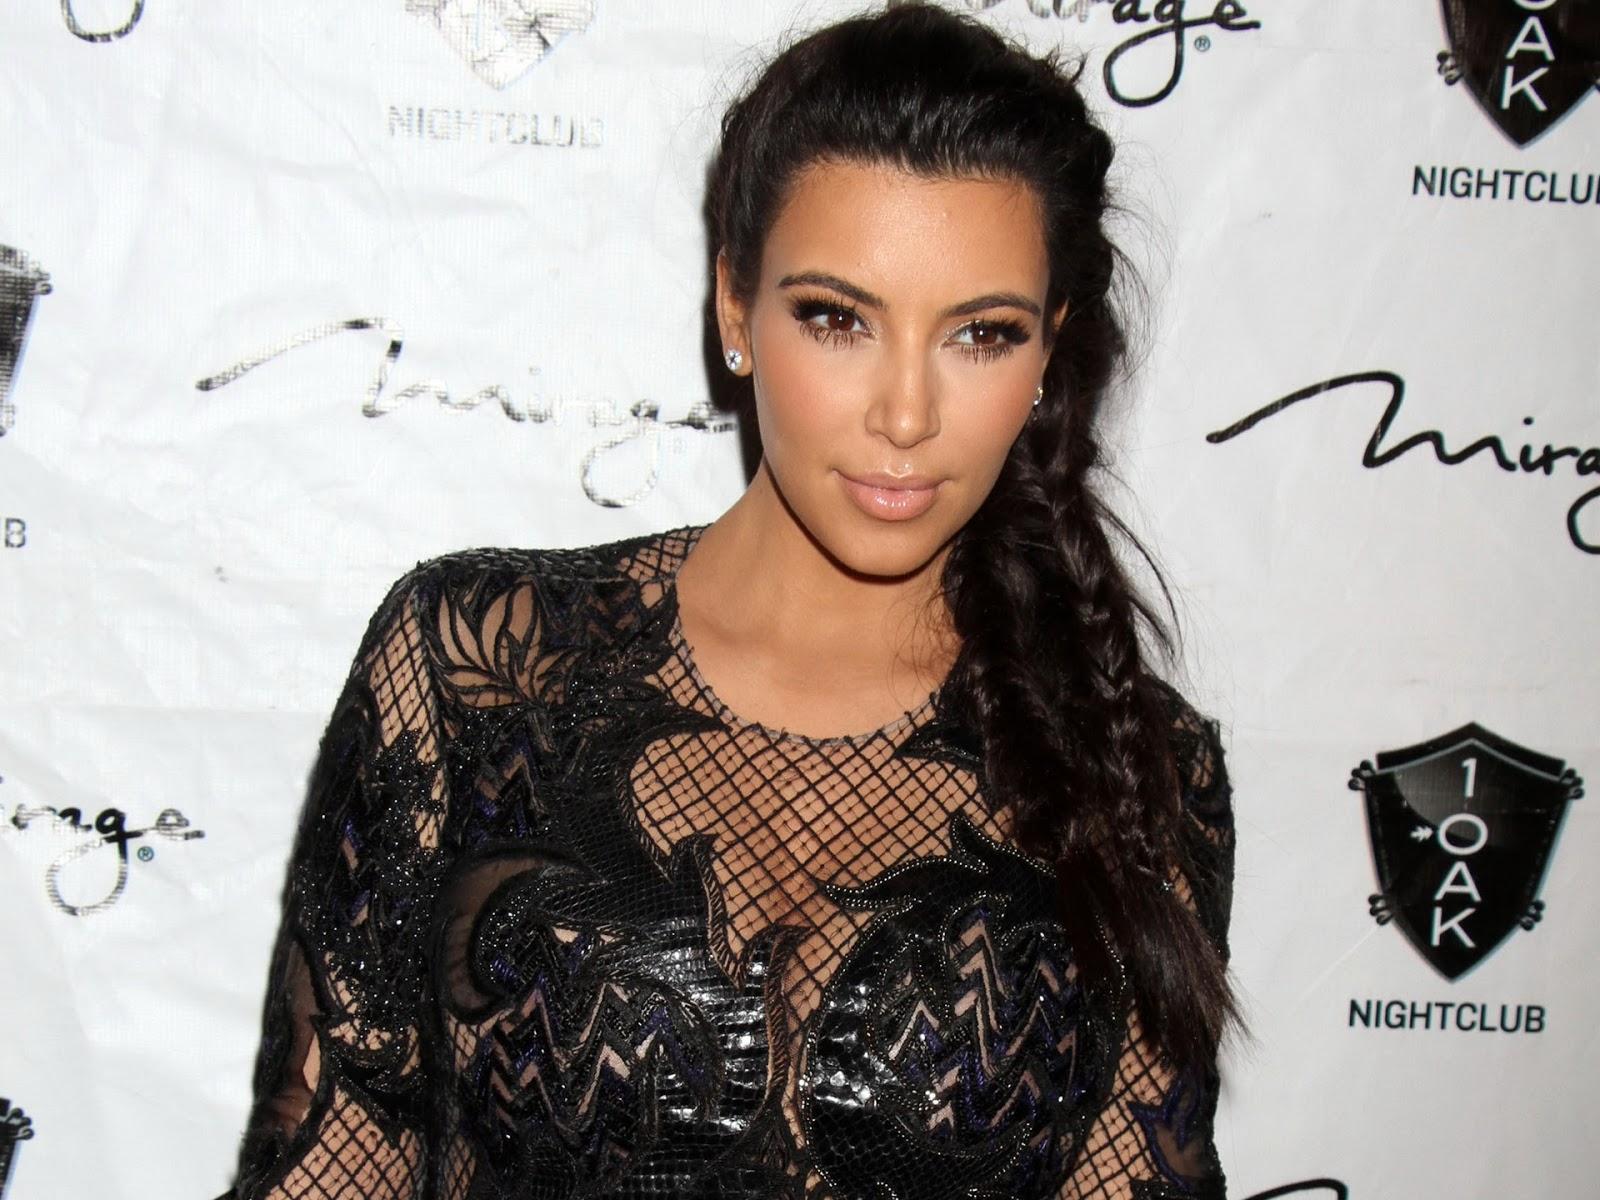 Kim Kardashian New Hot HD Wallpaper 2013 Hollywood Universe 1600x1200